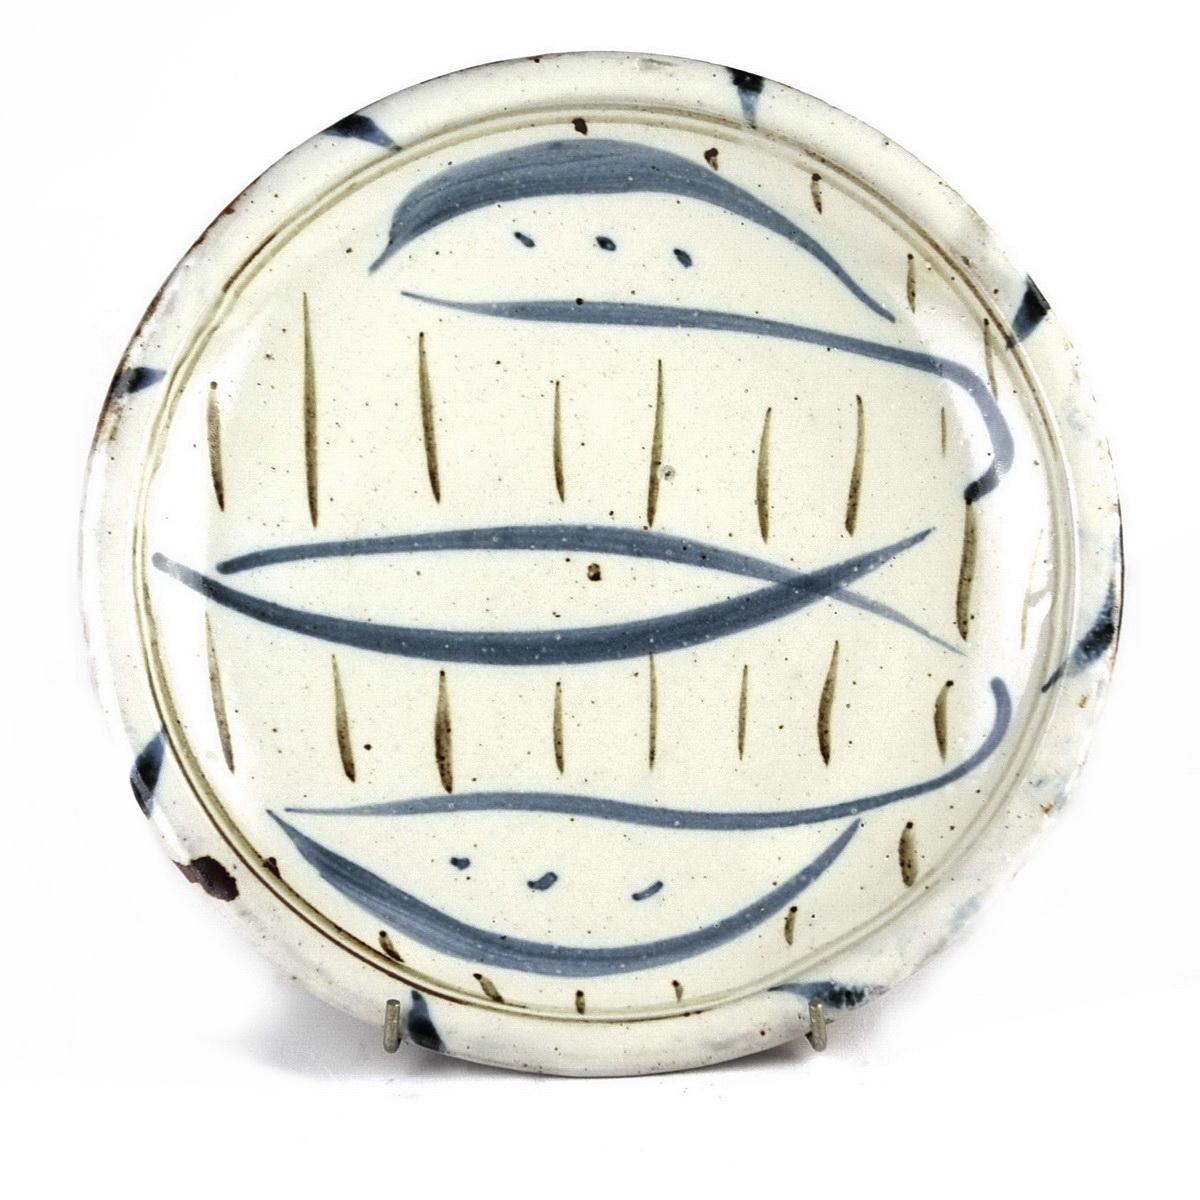 Michael Cardew ceramic stoneware dish with foliage brush work design to well